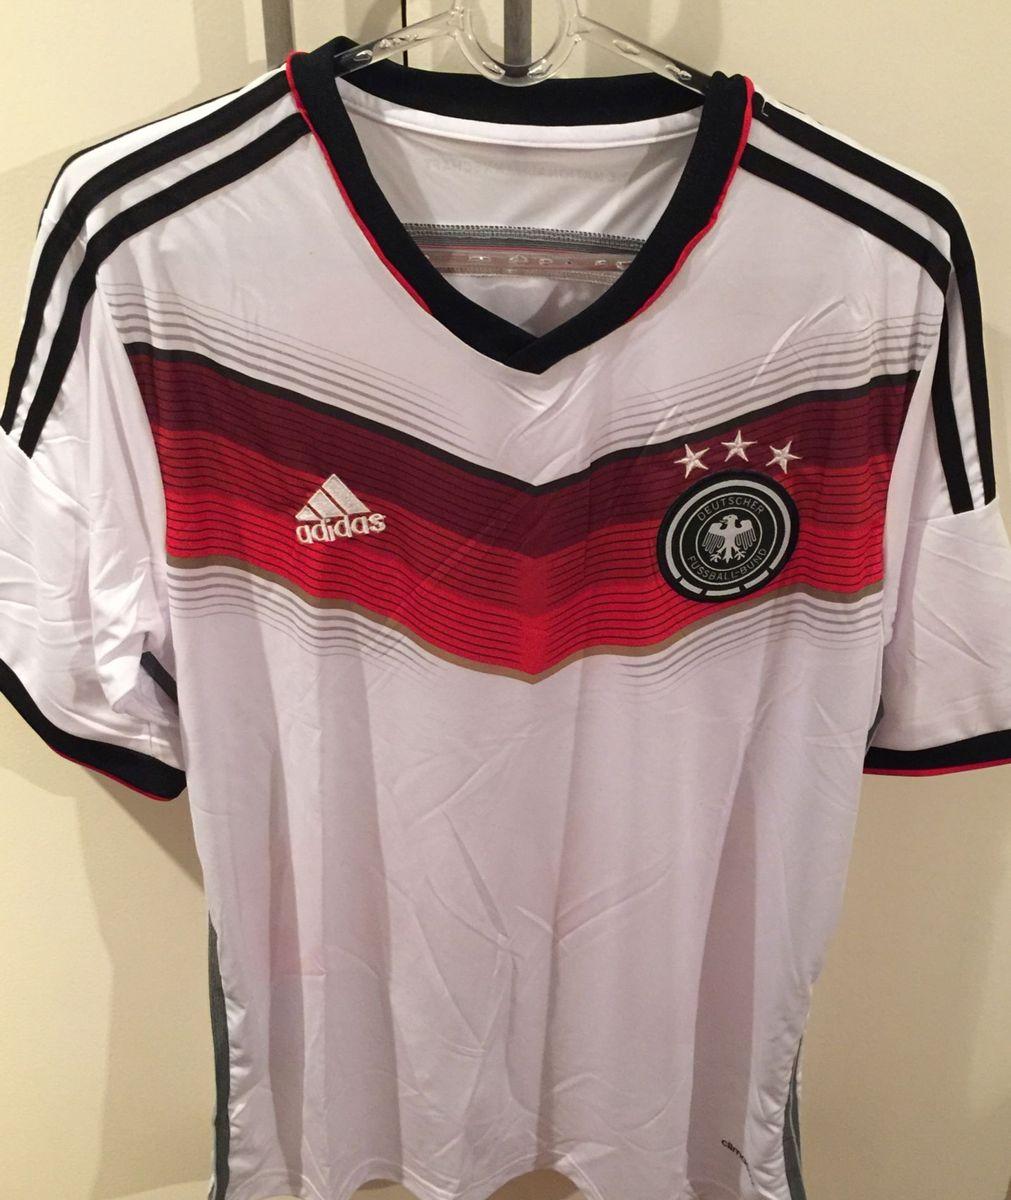 6c894c3bf0 camisa adidas alemanha copa 2014 - oficial - esportes adidas